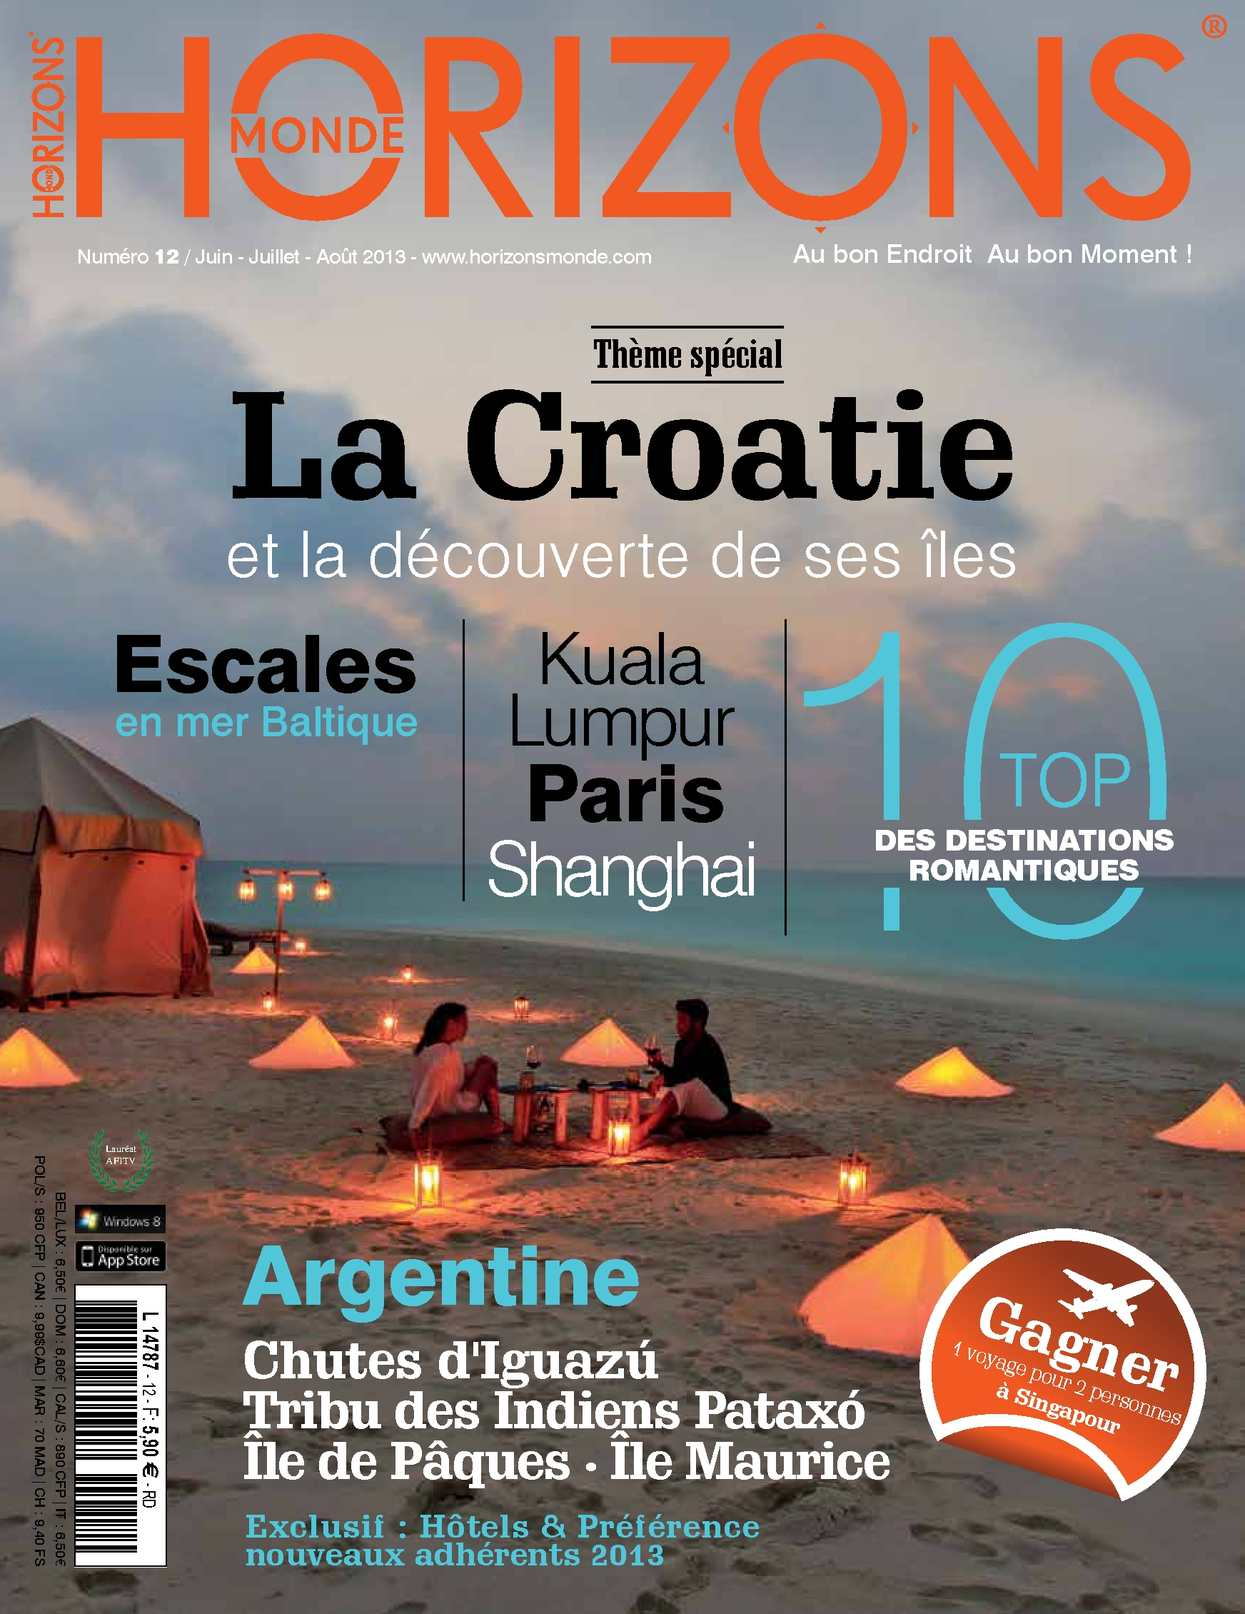 HORIZONS MONDE N°12 été 2013